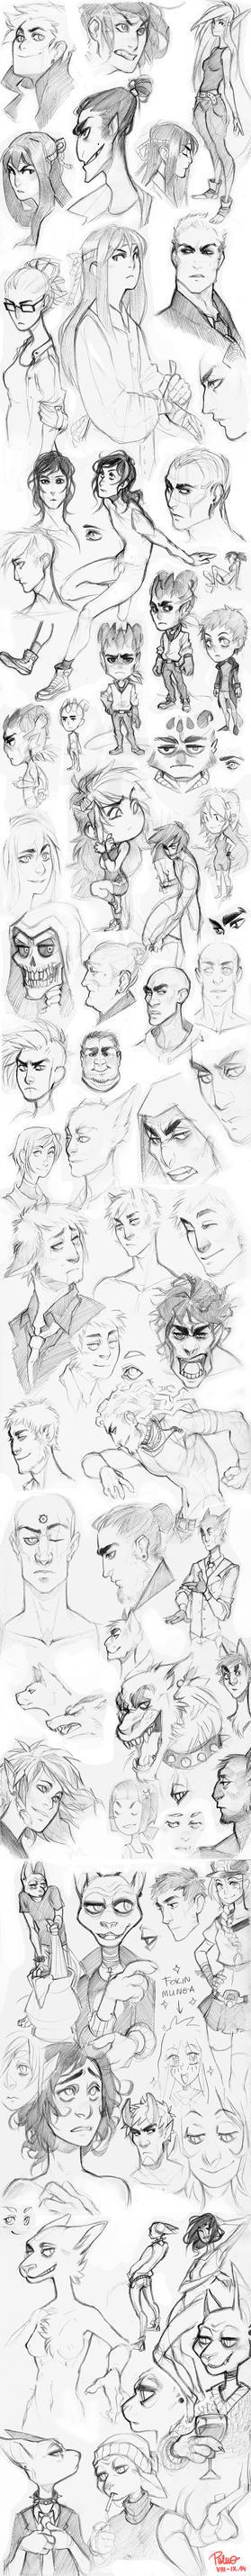 Sketch dump 02 by GoldenTar